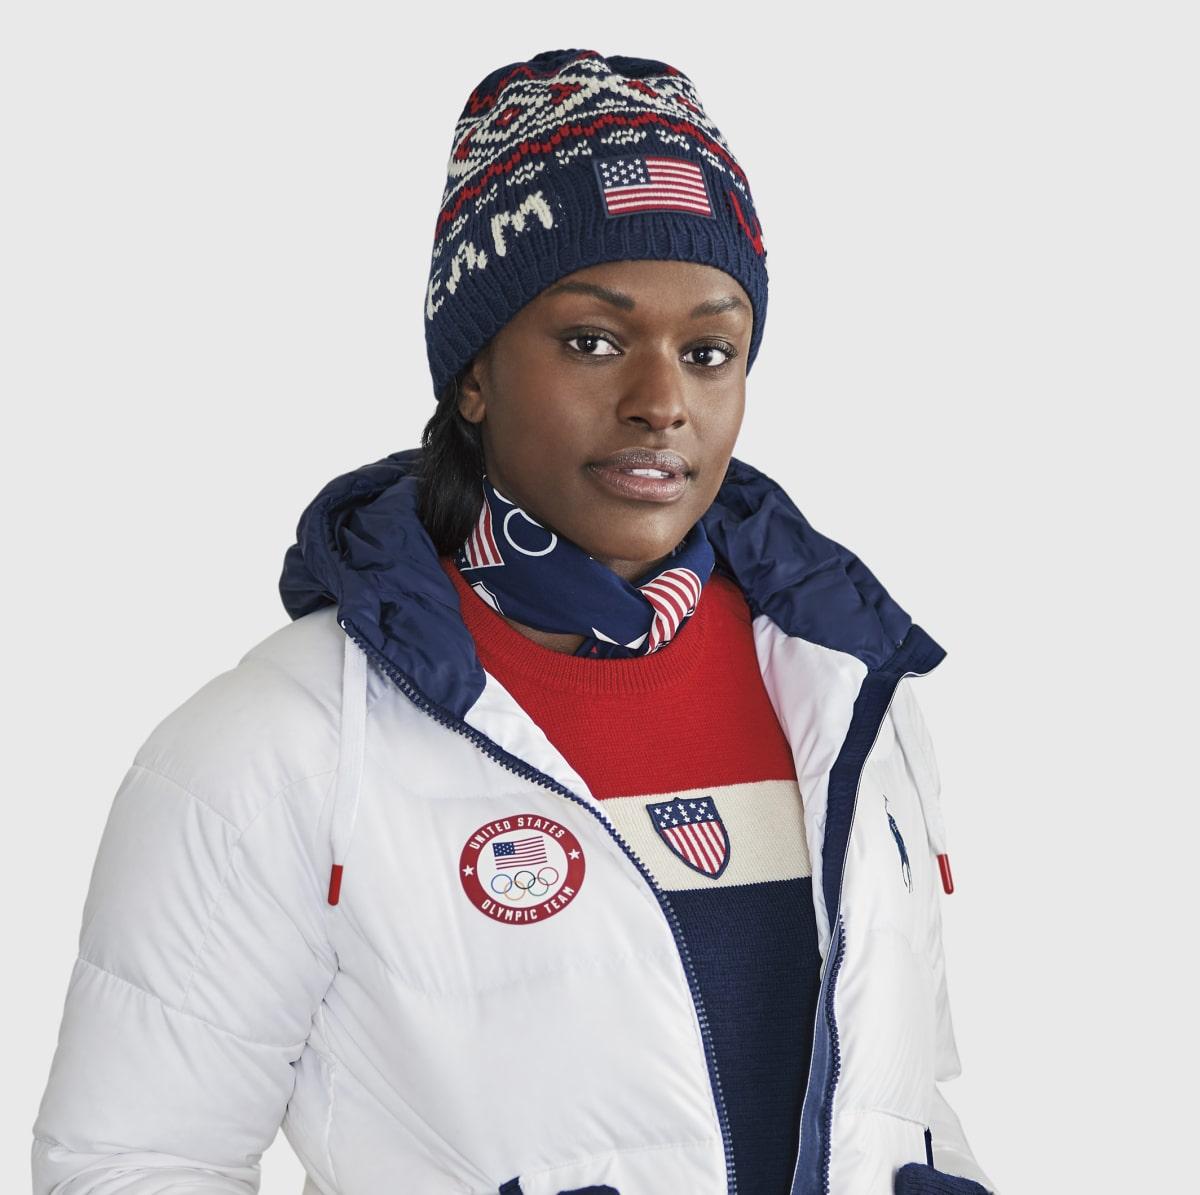 Aja Evans in Ralph Lauren closing ceremony outfit Winter Olympics 2018